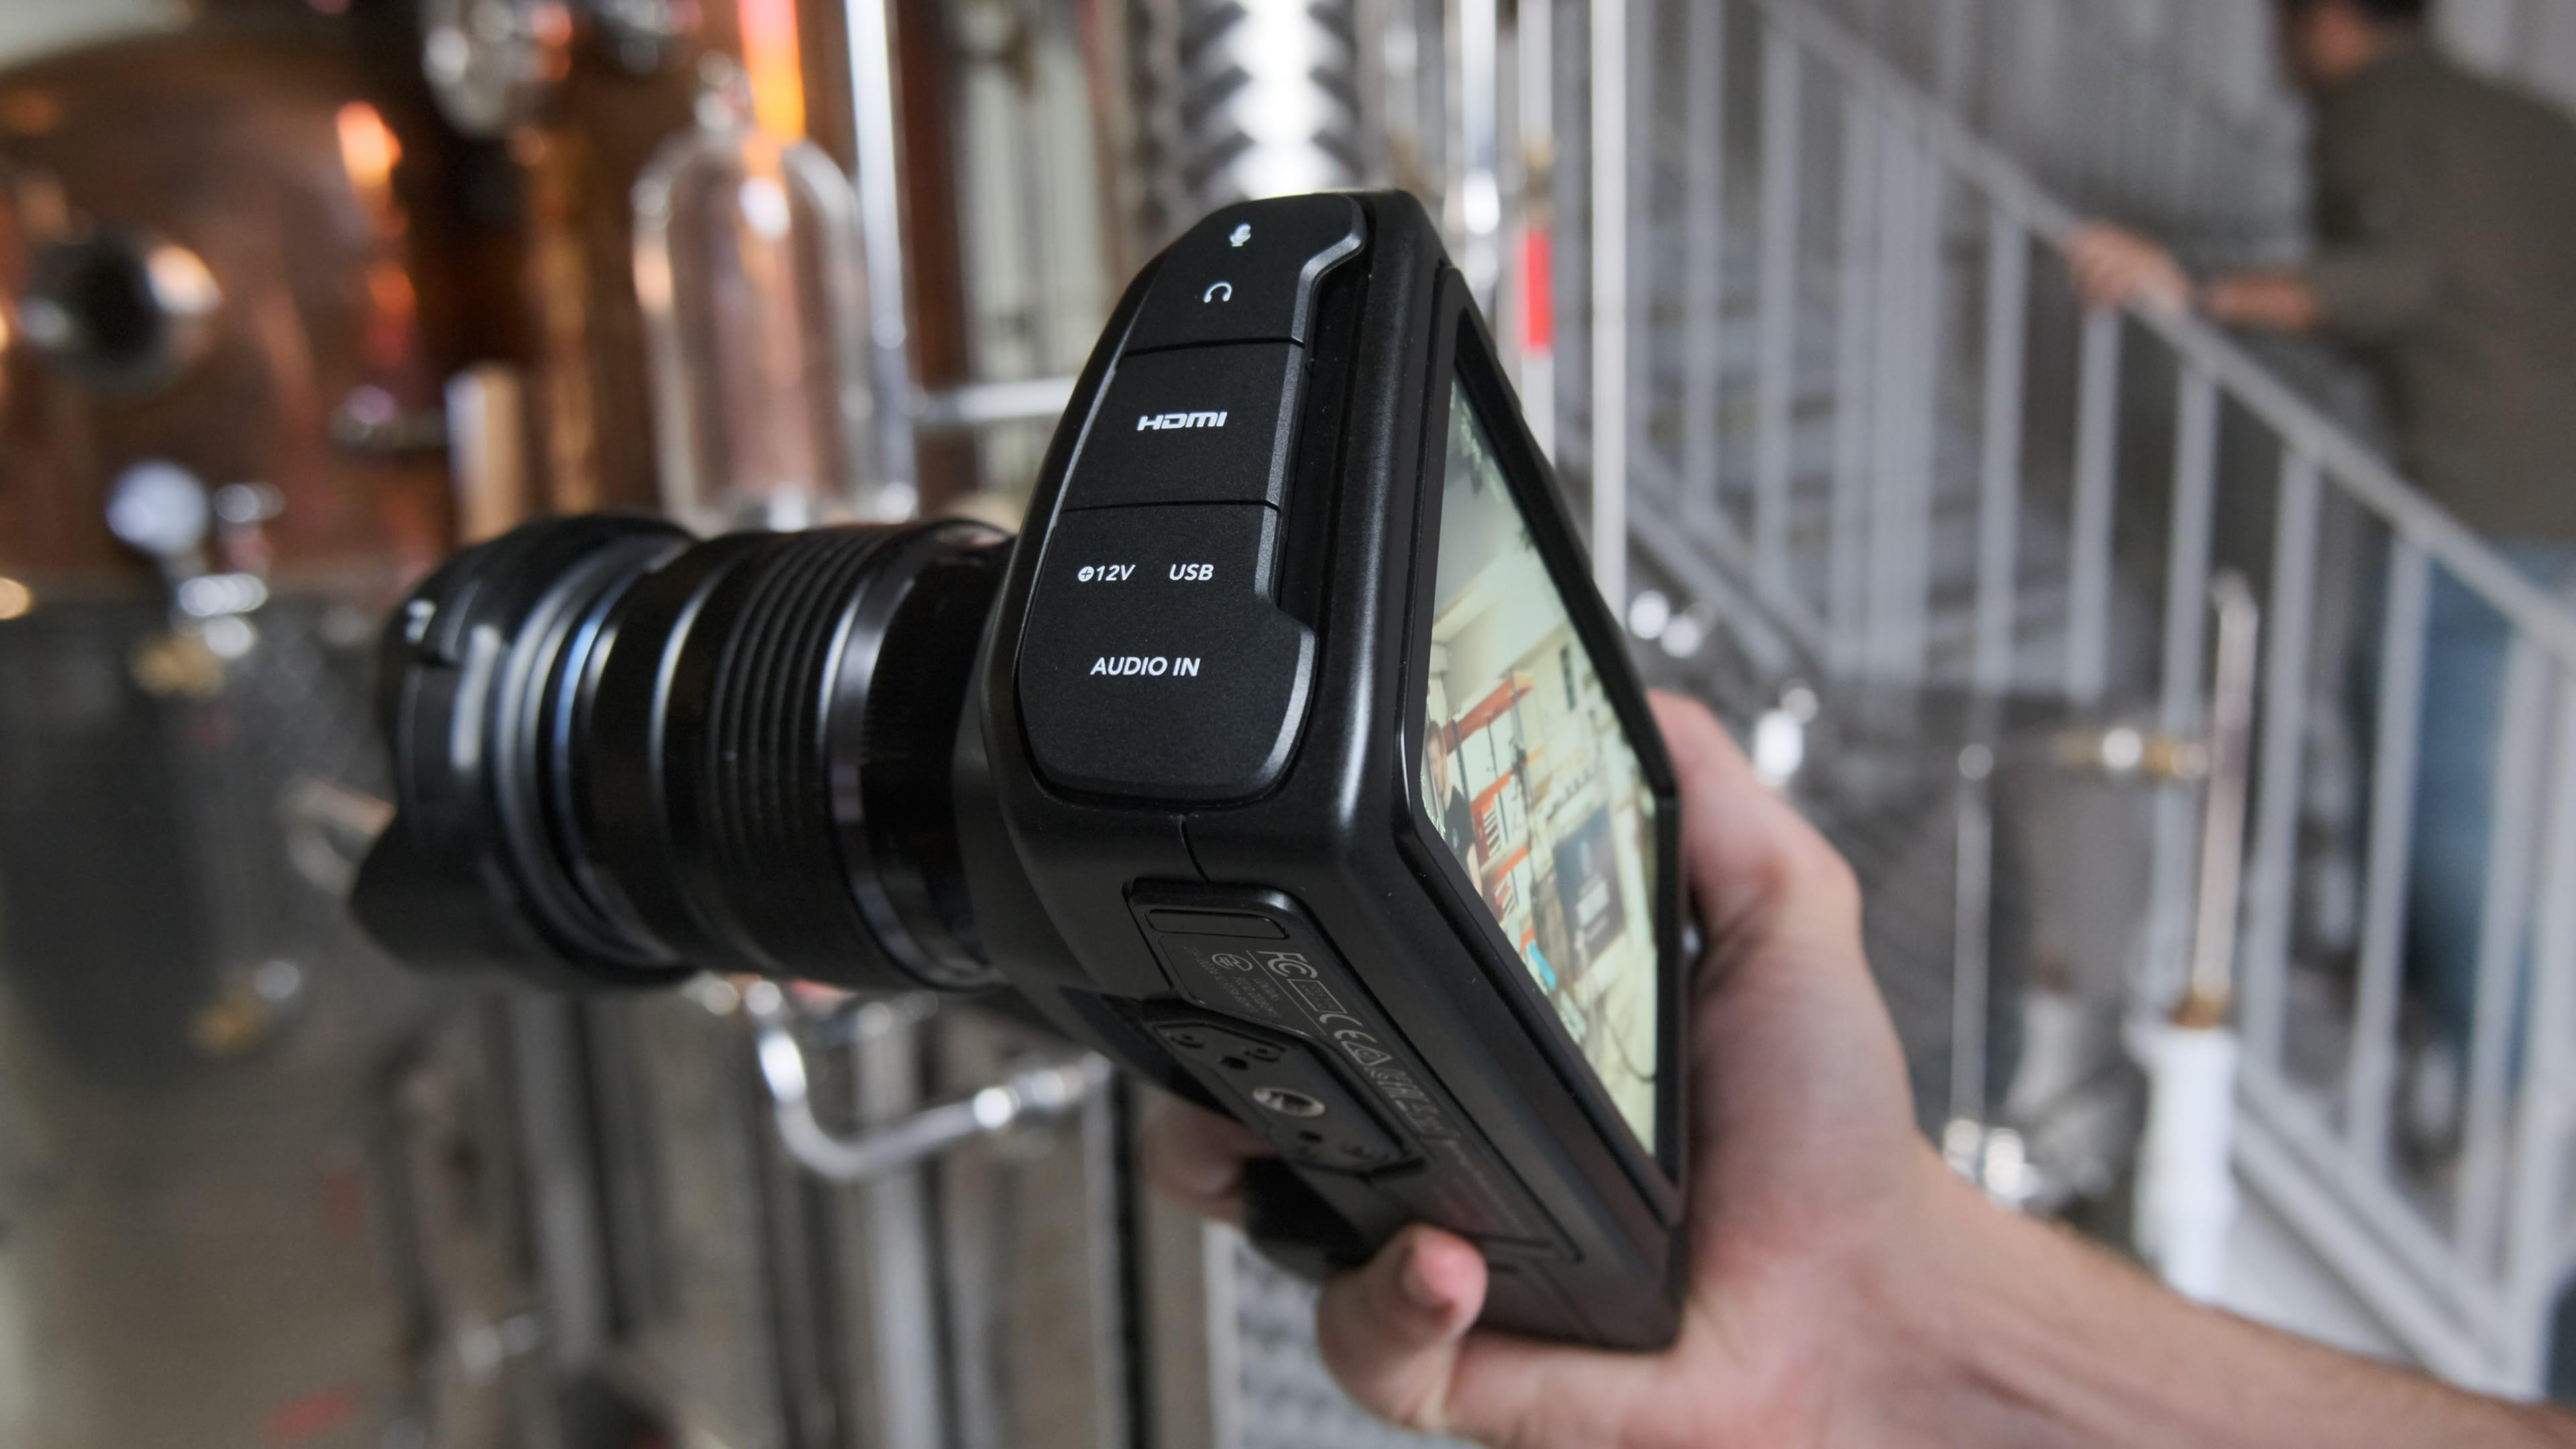 Blackmagic Pocket Cinema Camera 4k Dual Iso Explained And Lowlight Footage Cined